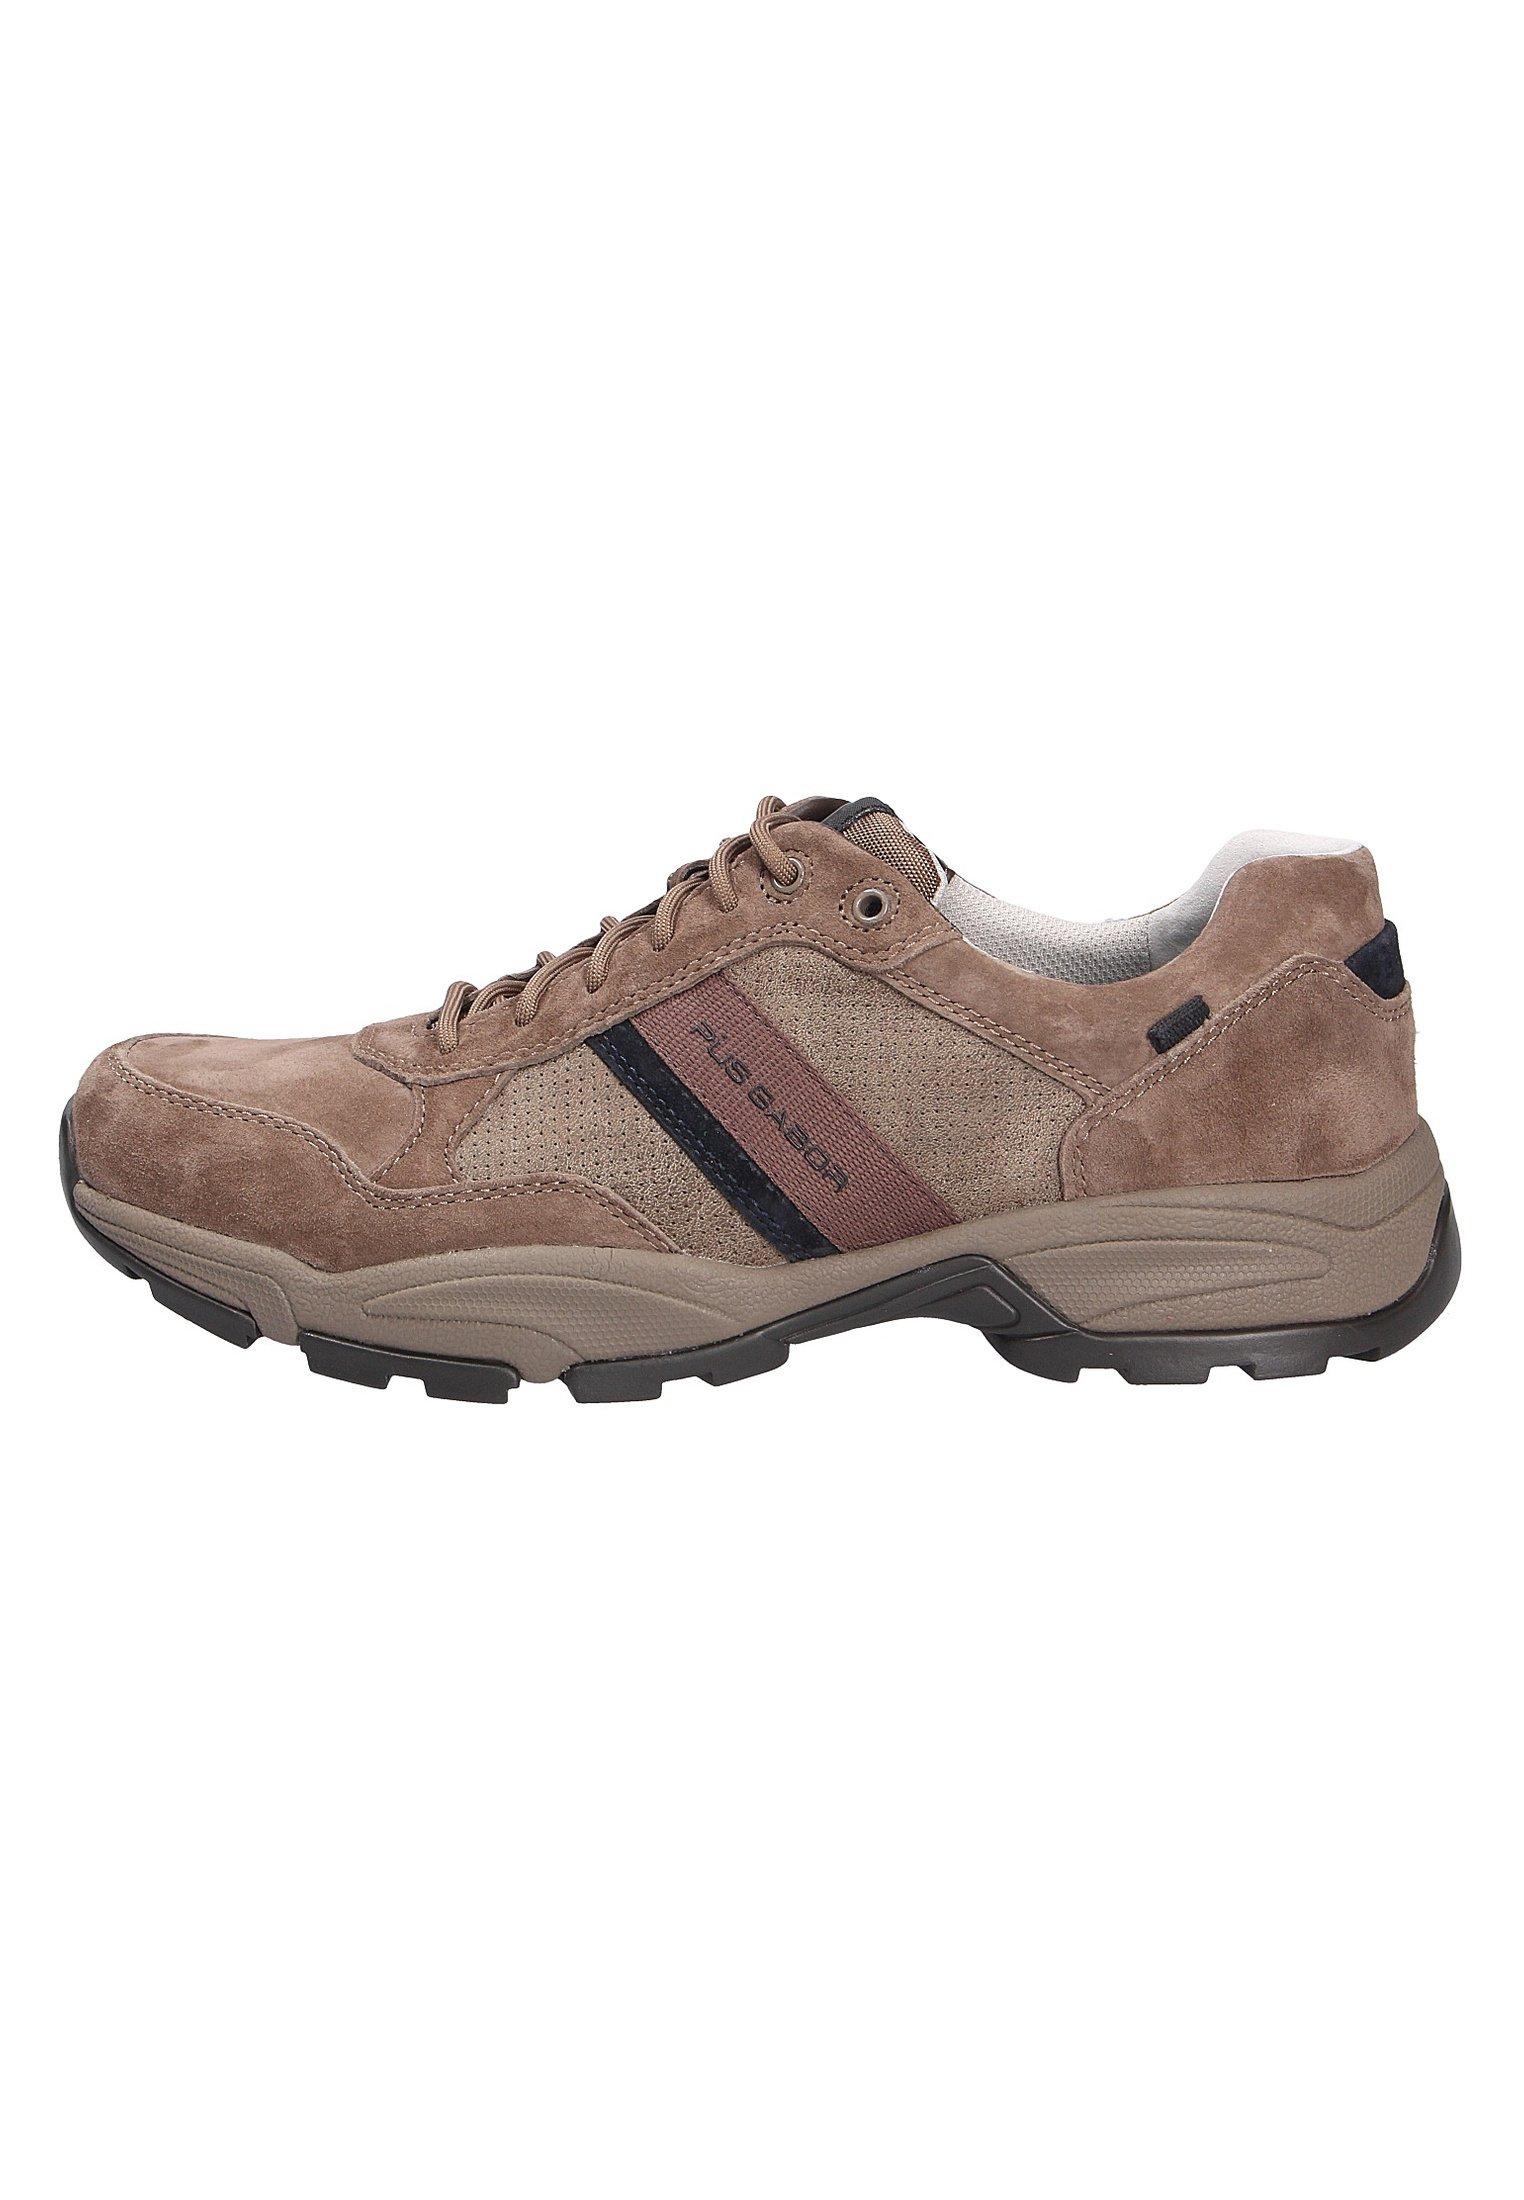 Homme Chaussures à lacets - ltbrown